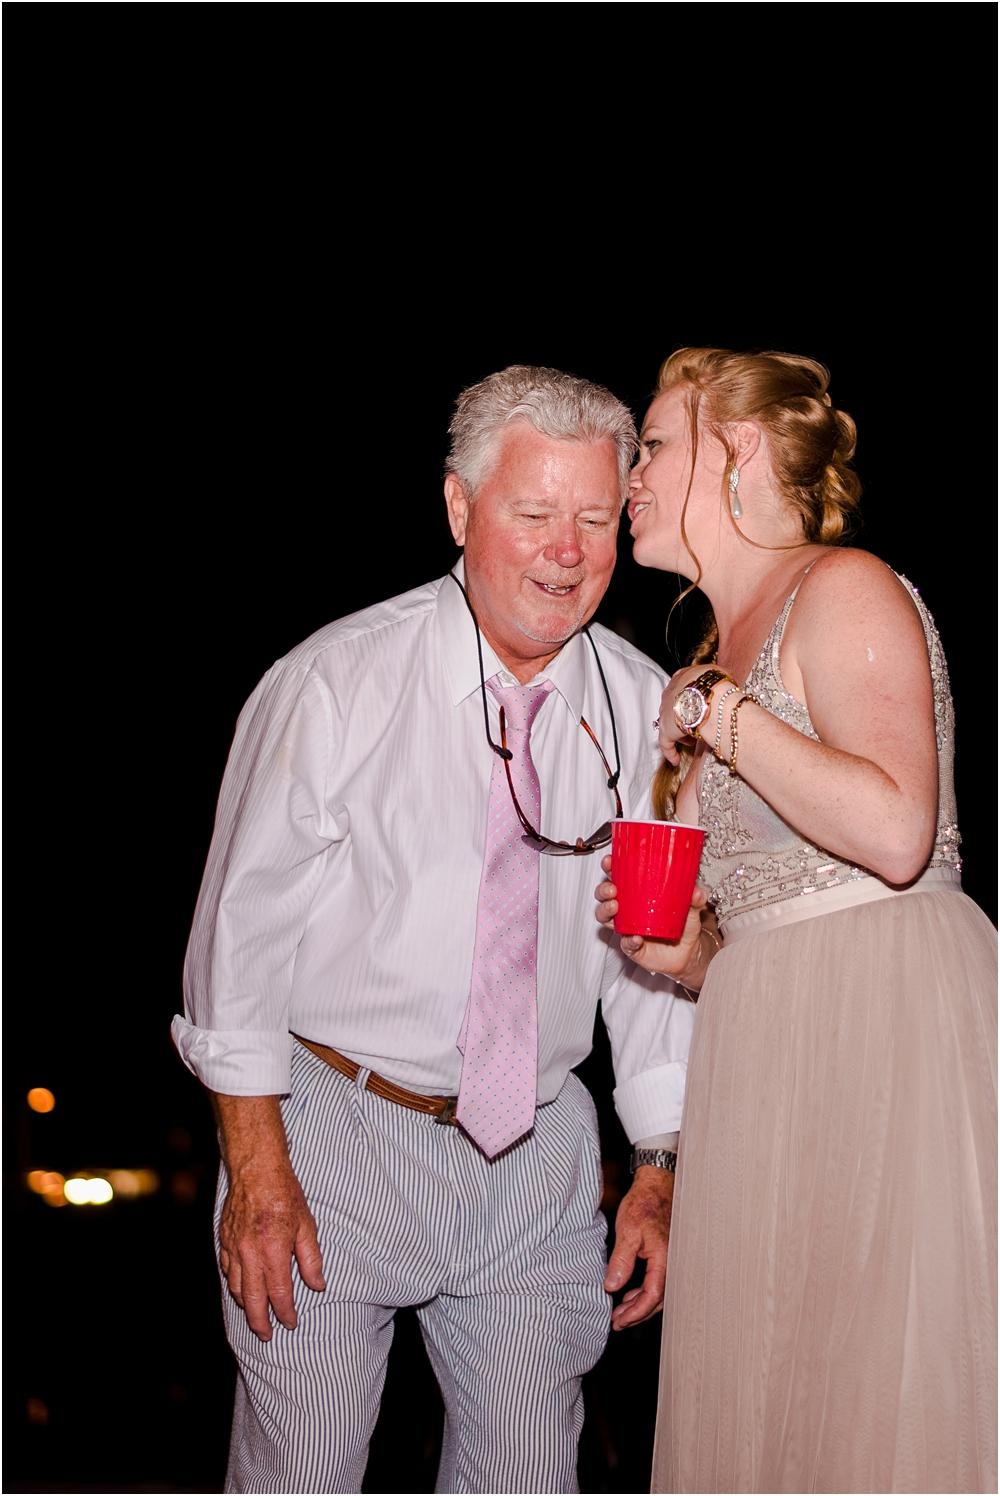 st-joe-florida-wedding-photographer-kiersten-grant-153.jpg